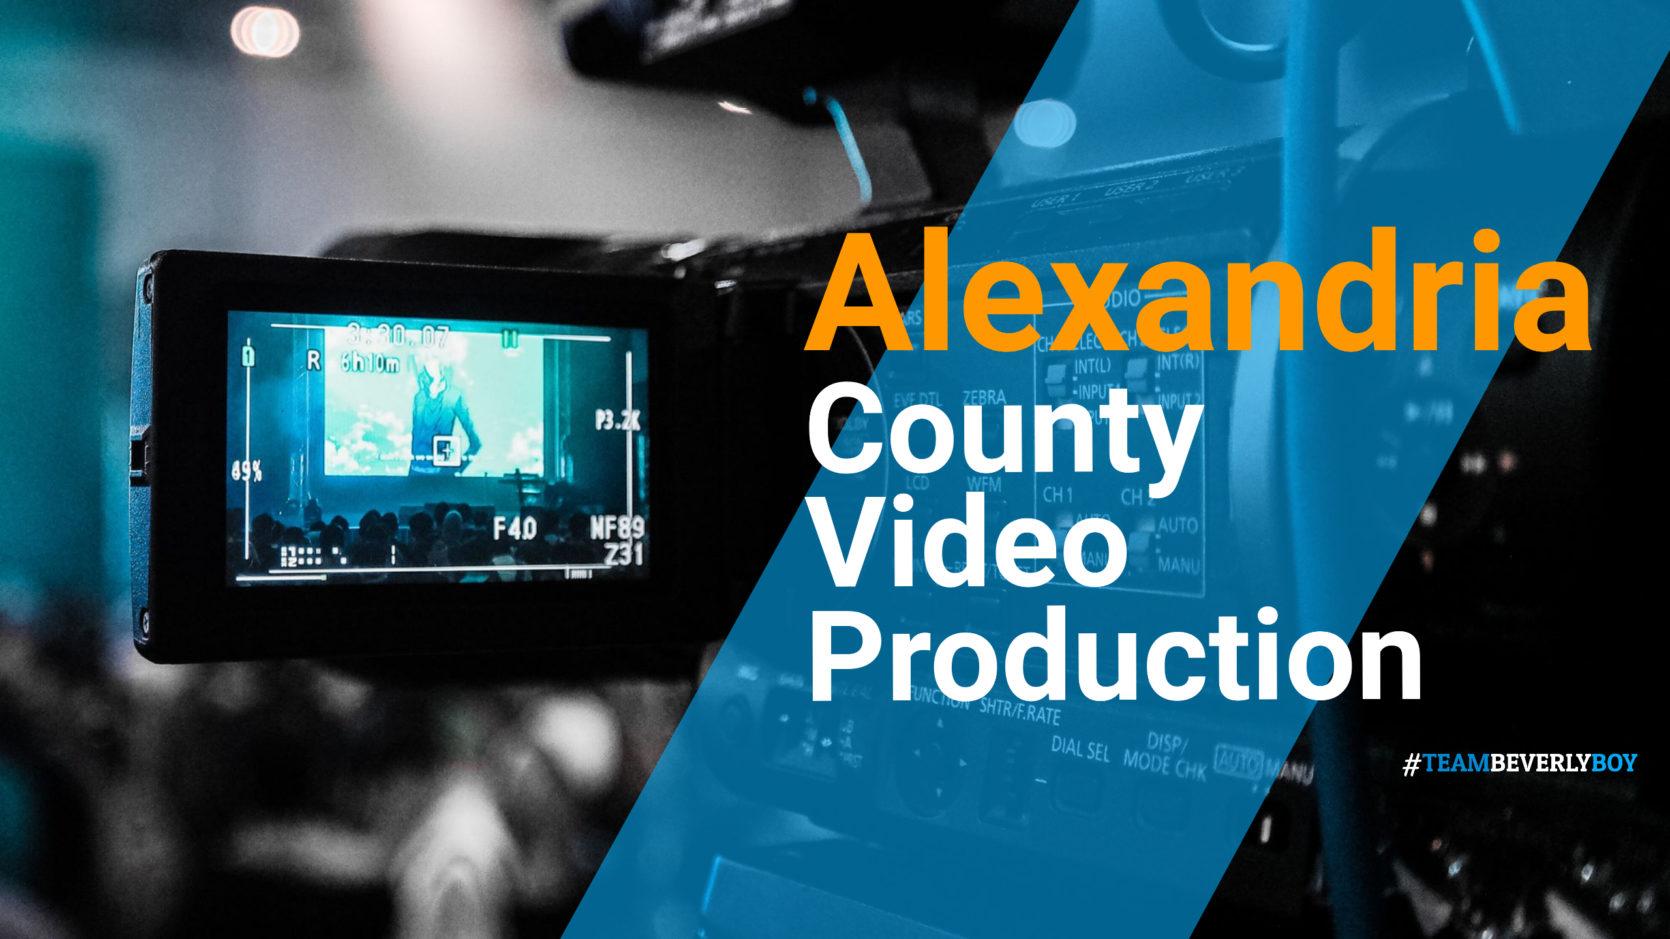 Alexandria County Video Production